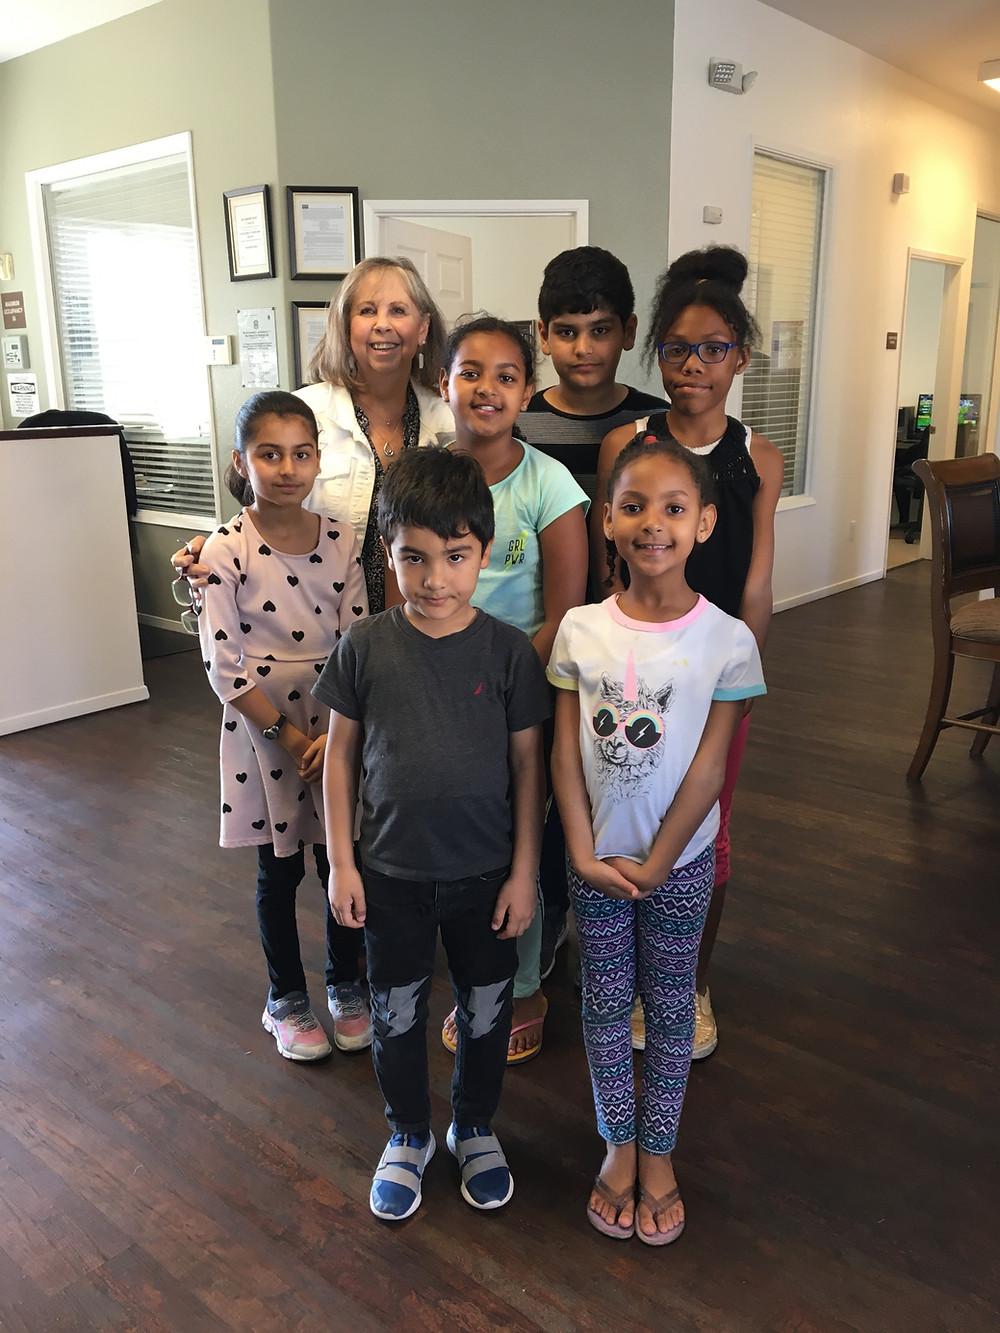 Judi Boston-shedd with Willow Glen kids